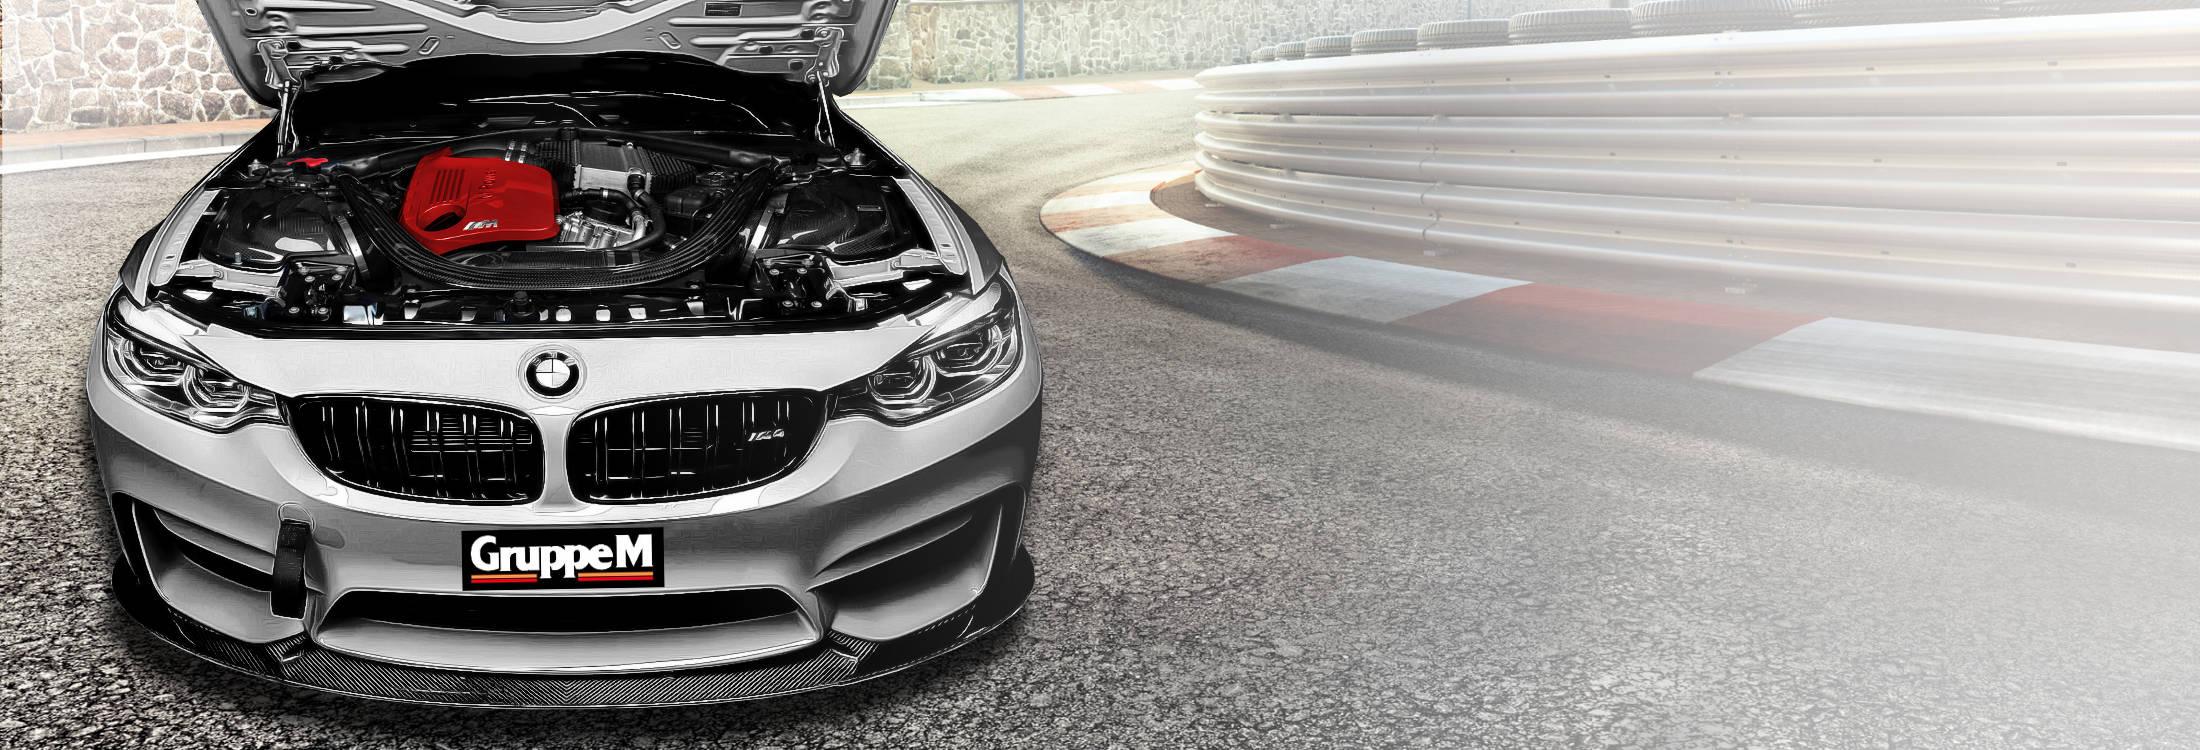 BMW Engine Bay with GruppeM